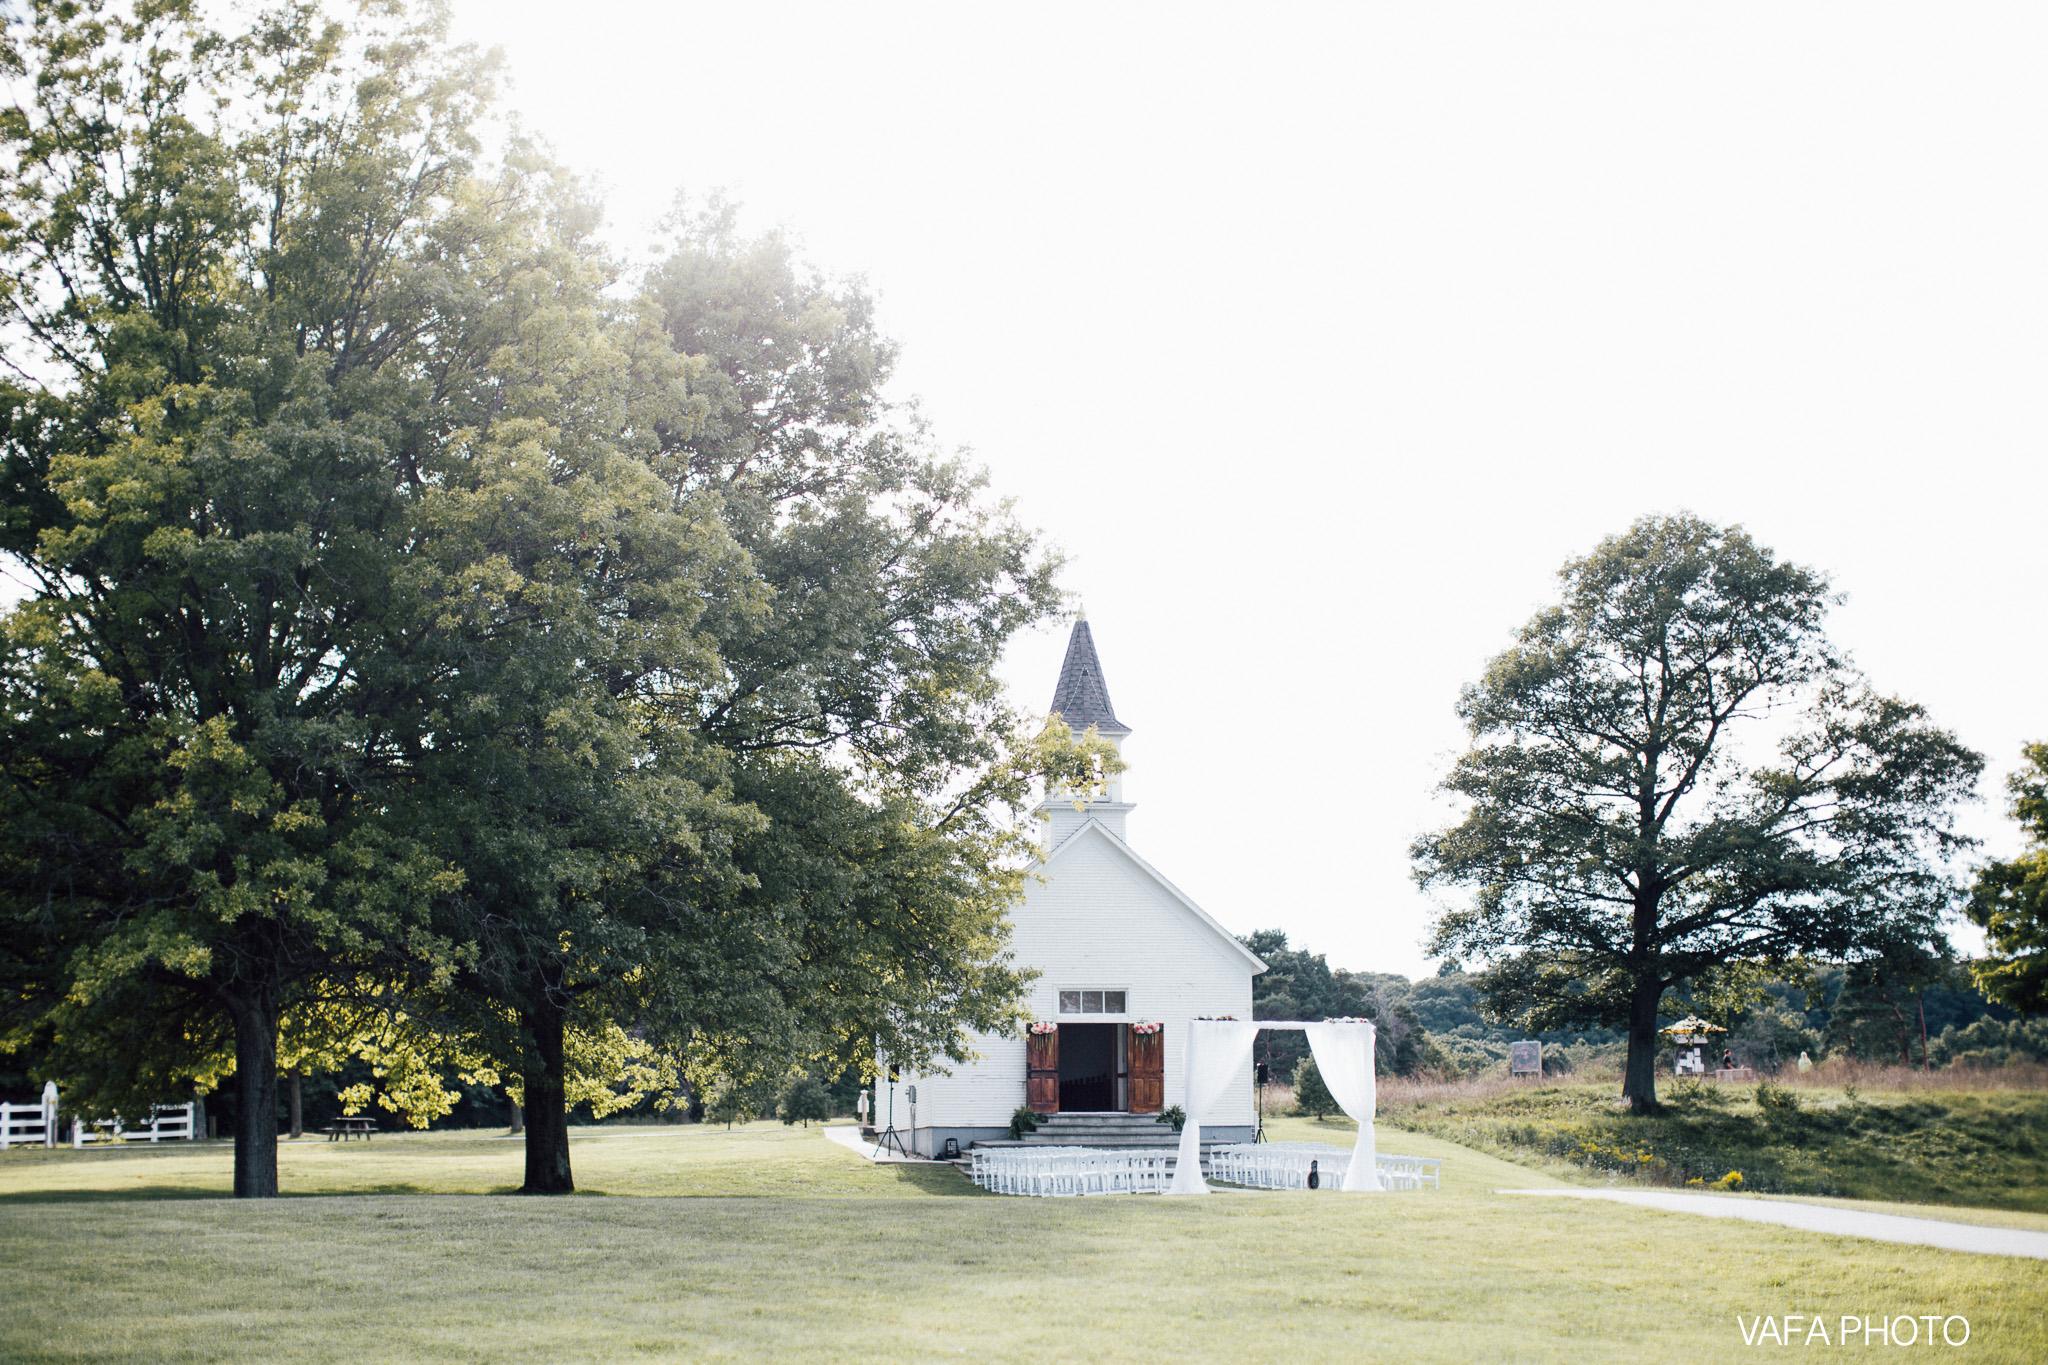 The-Felt-Estate-Wedding-Kailie-David-Vafa-Photo-220.jpg